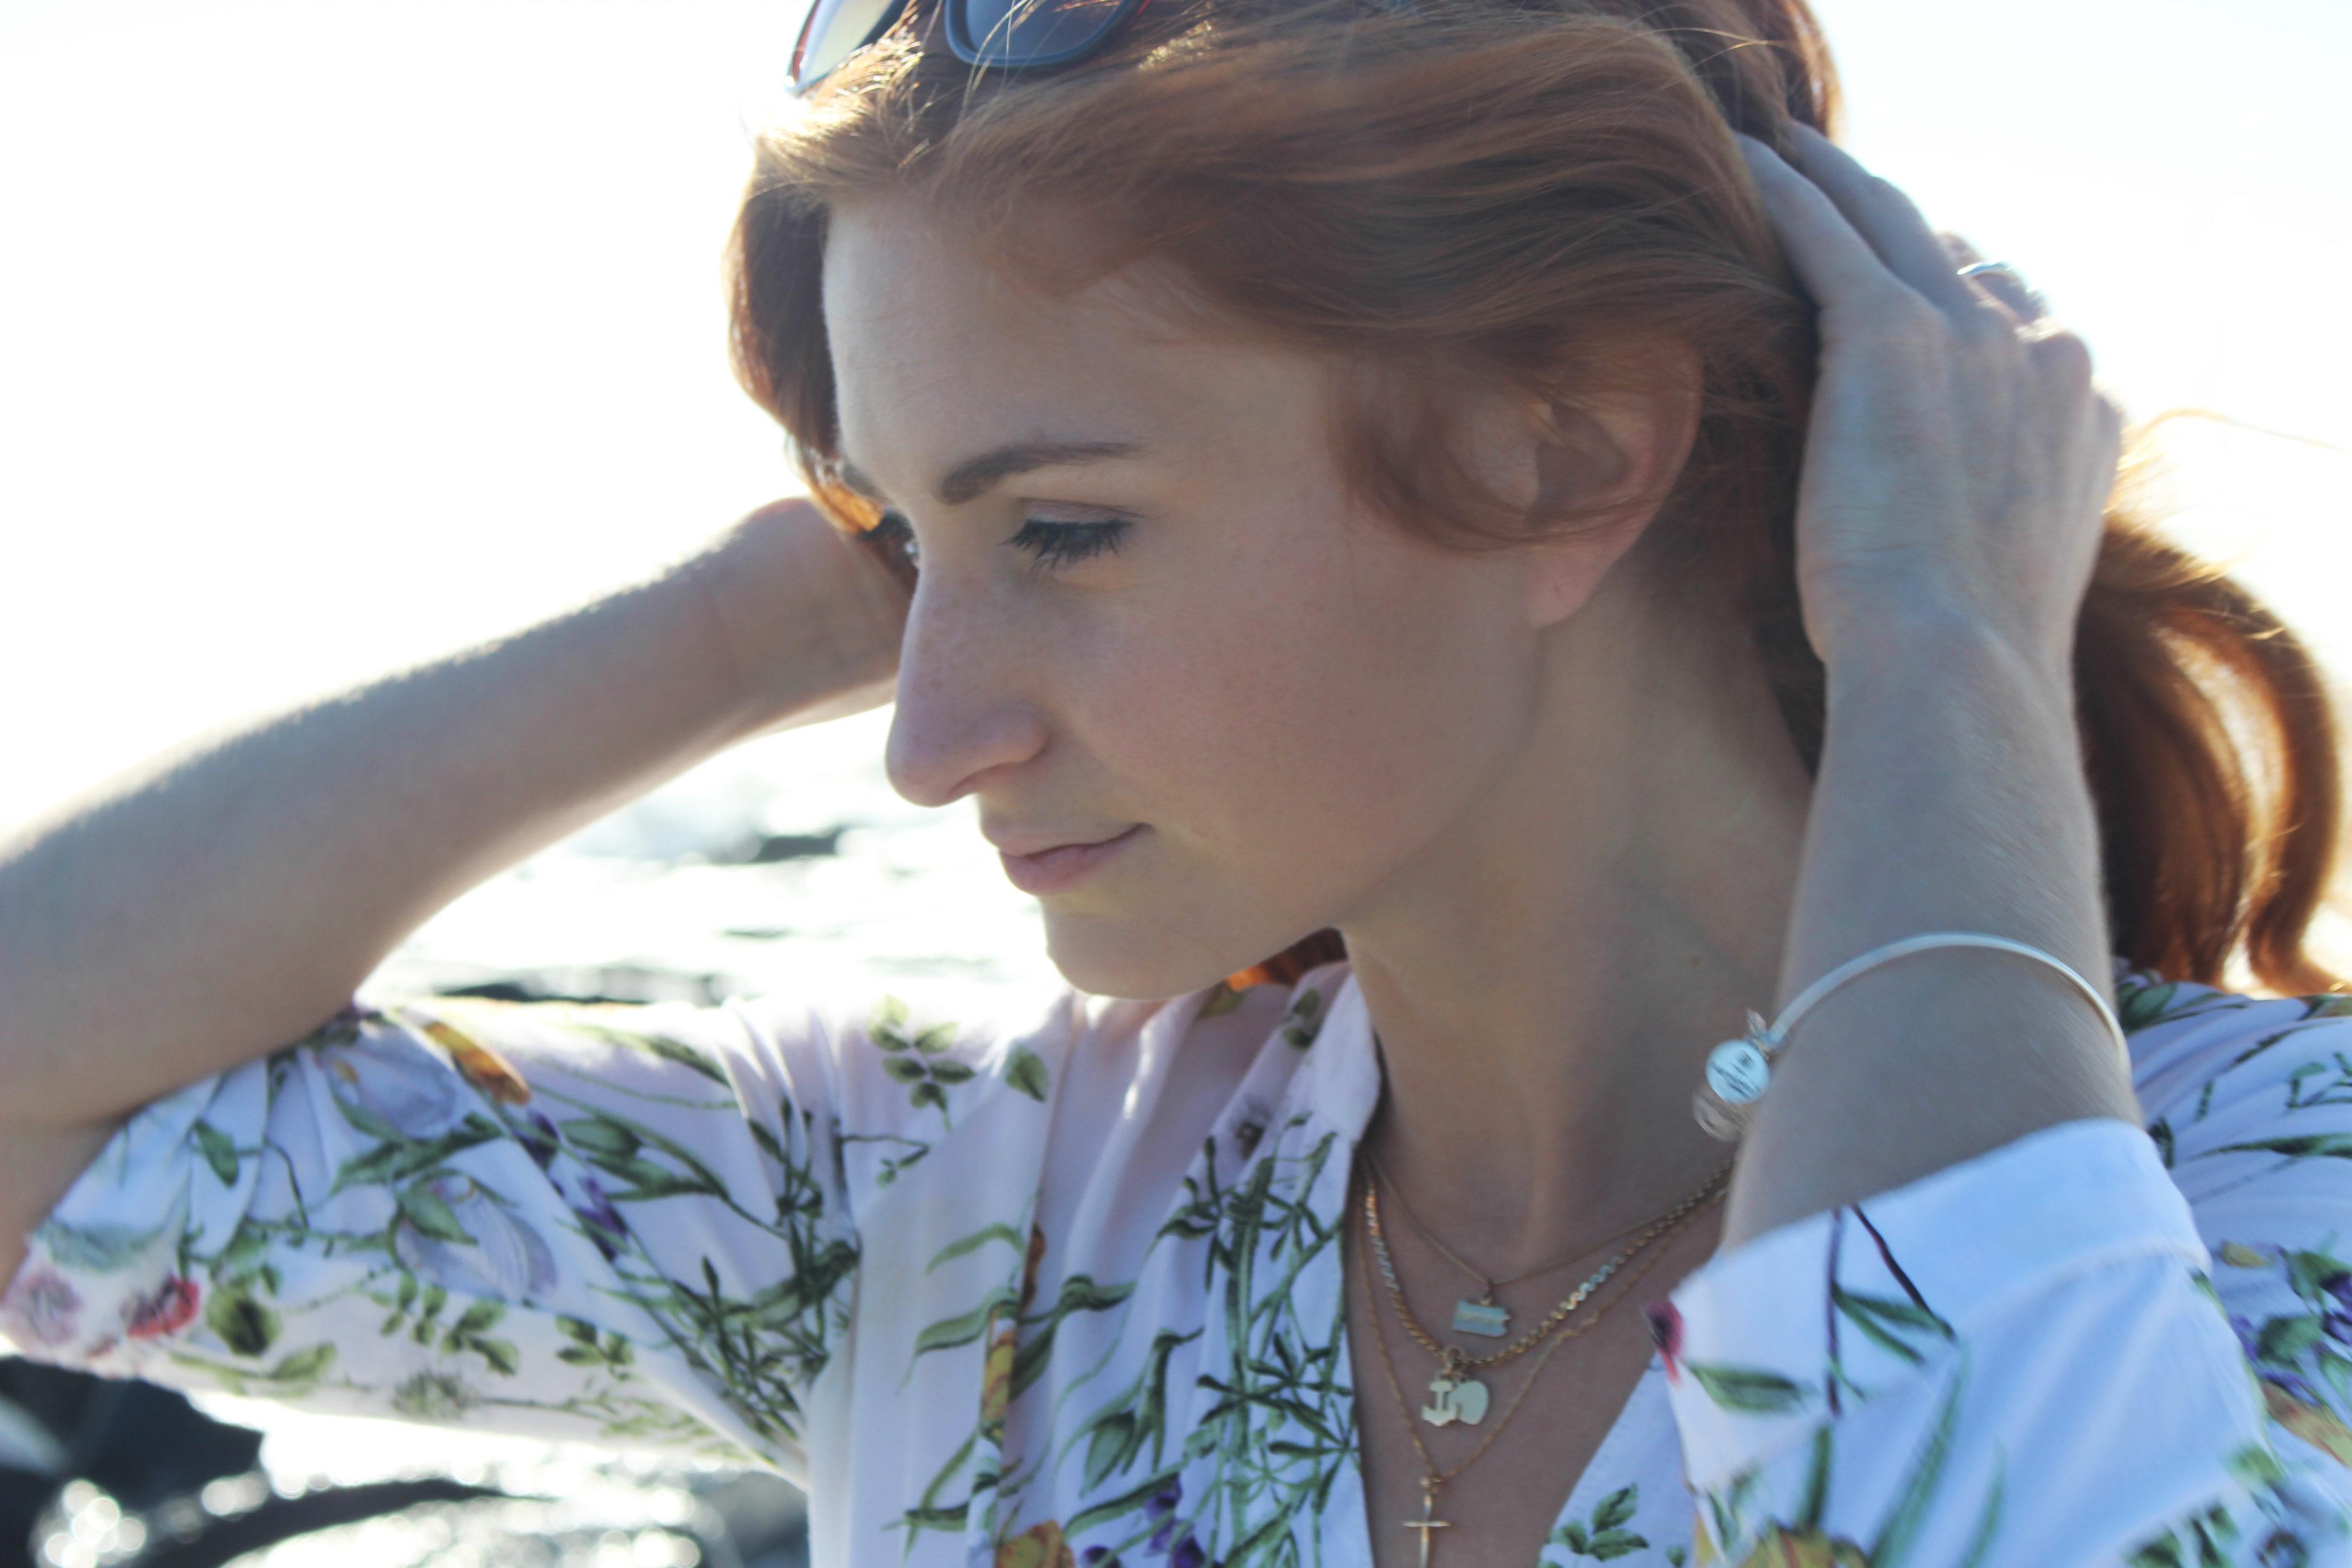 Redhead Girl pulling hair back wearing jewelry